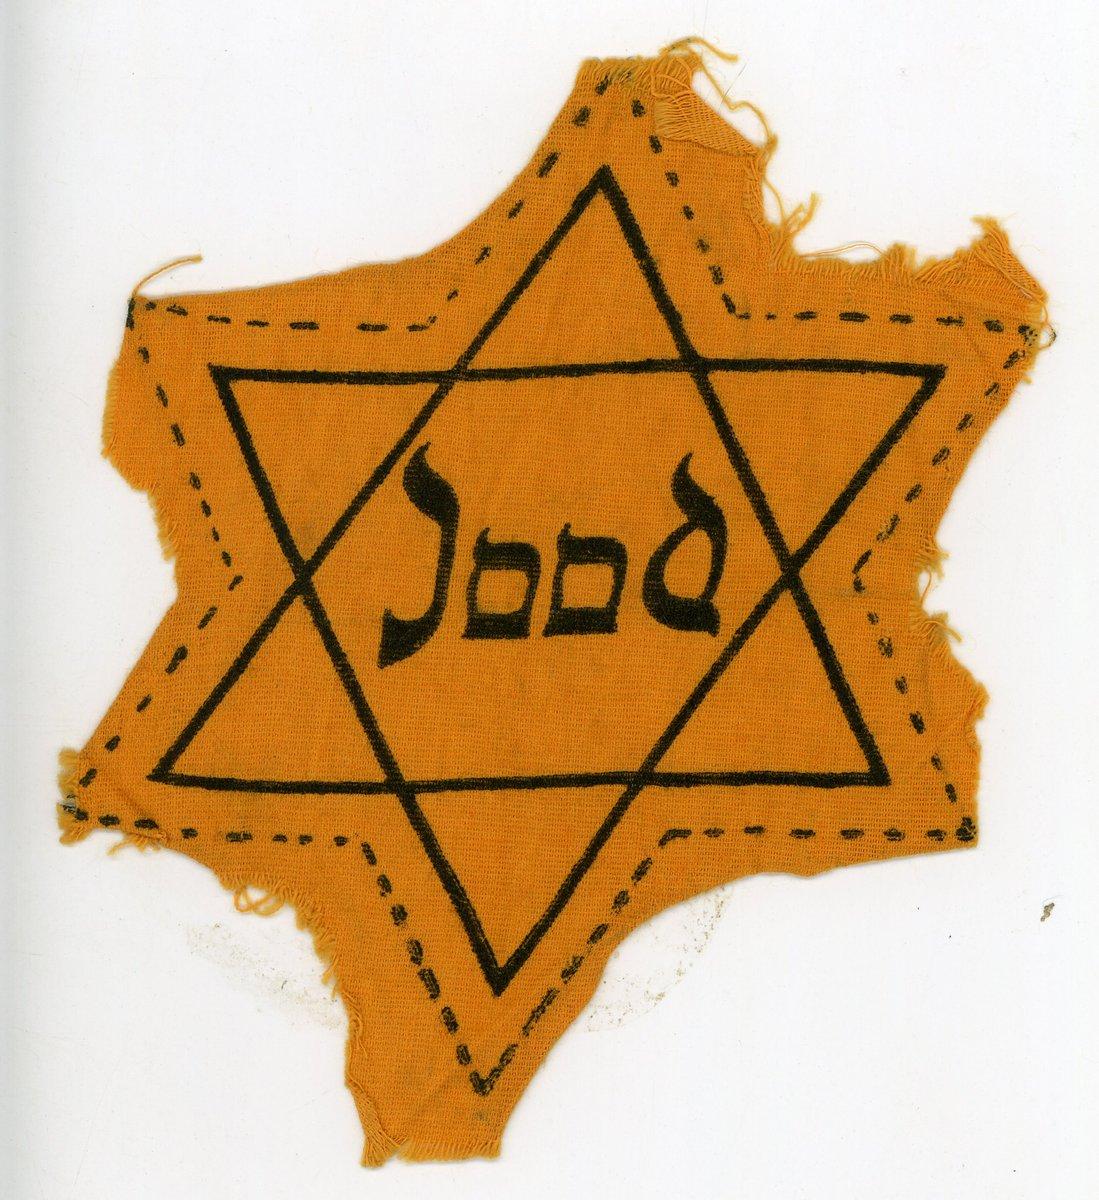 #yizkor #יזכור #WeRemember  #HolocaustMemorialDay  #HolocaustRemembranceDay